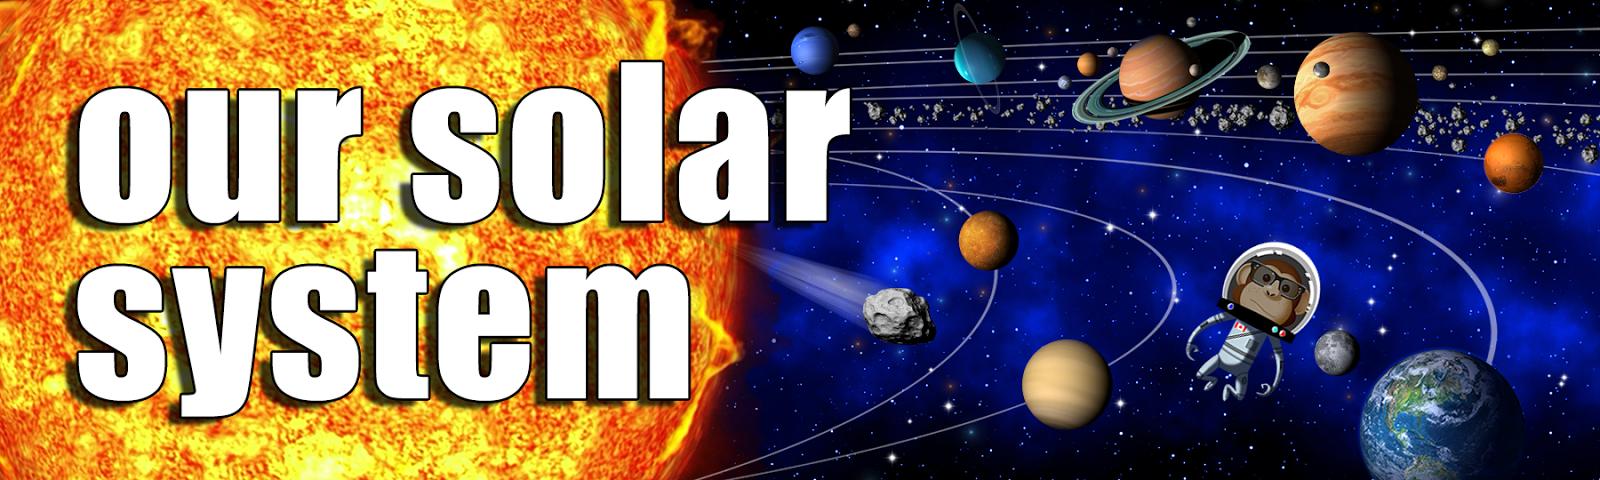 http://spacemanskipapp.blogspot.com/p/our-solar-system.html